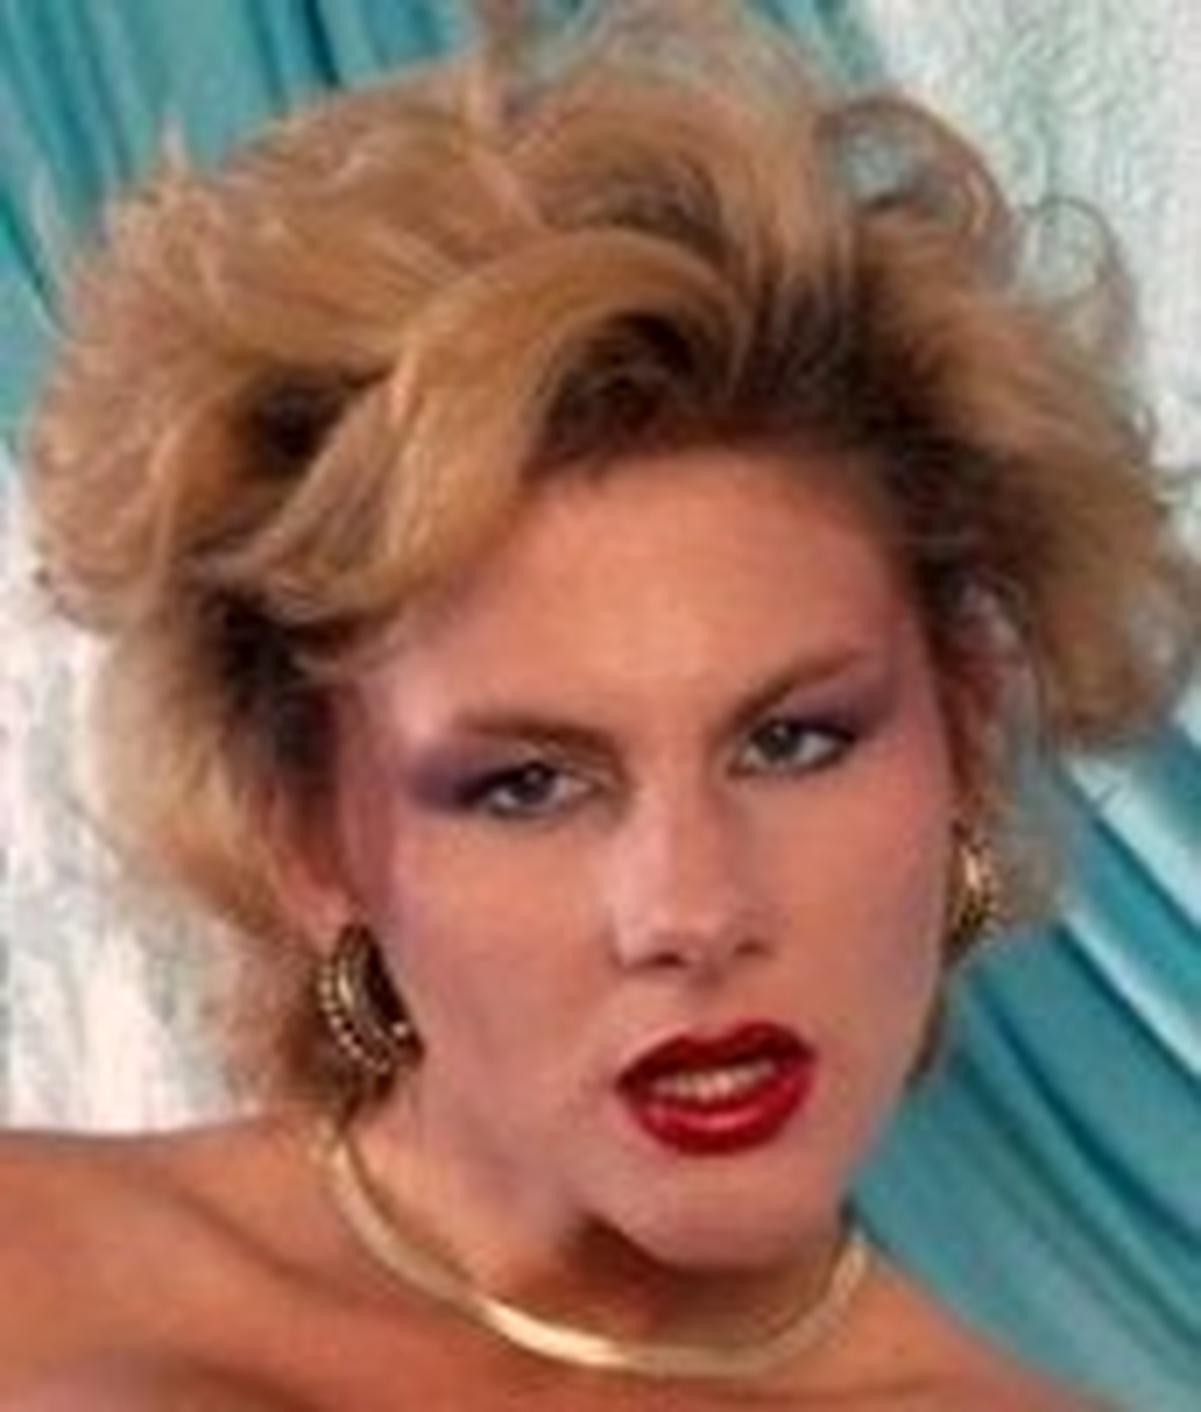 Joy karins porn star